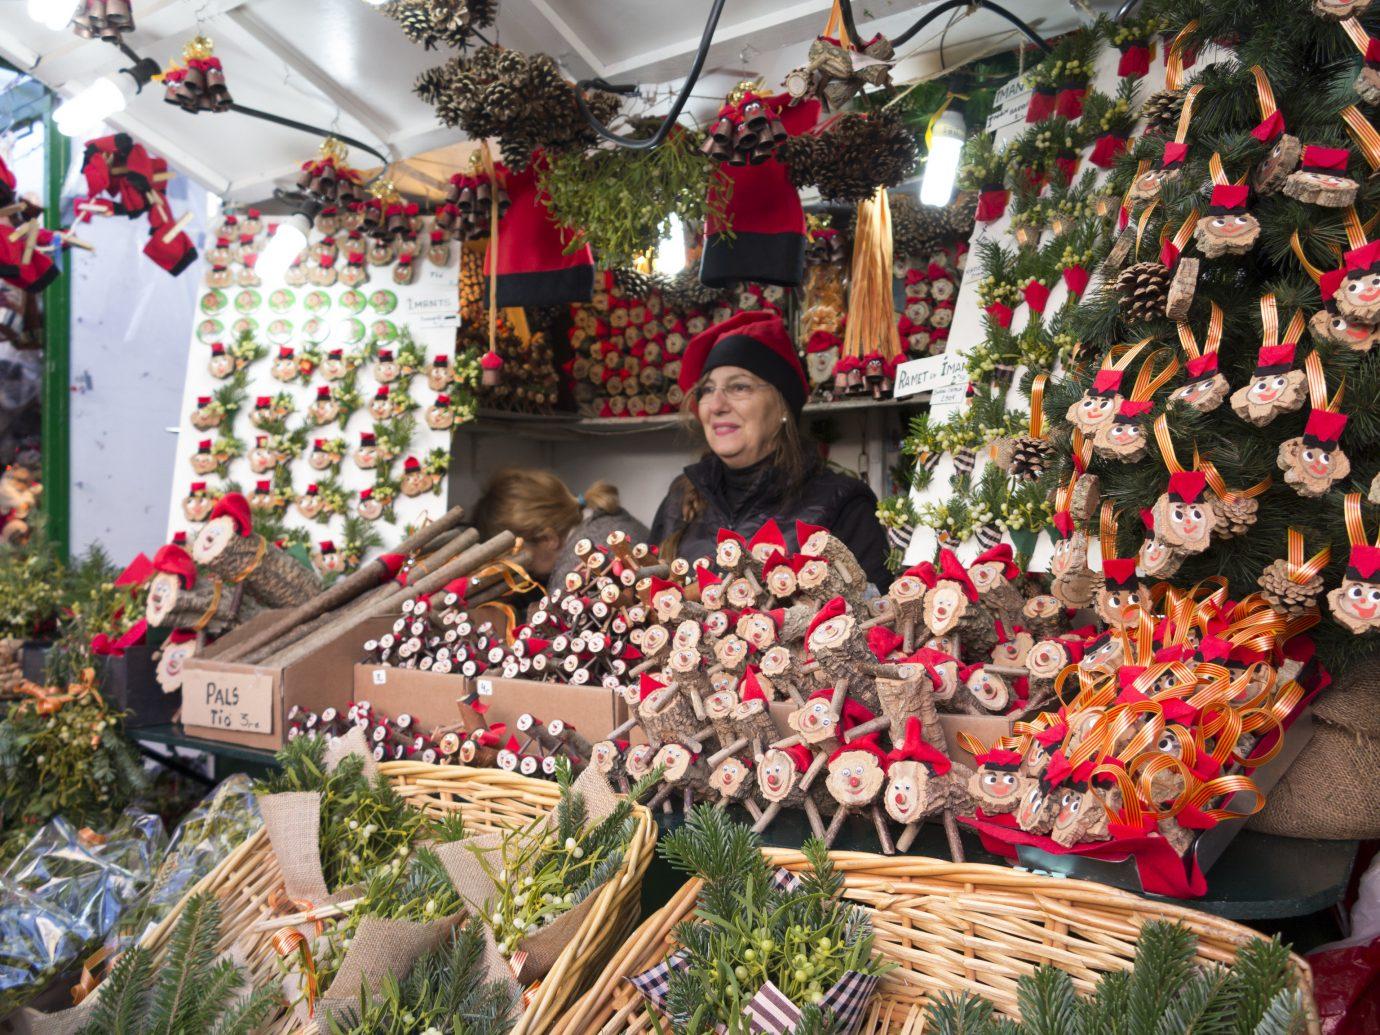 Trip Ideas marketplace public space City Christmas market christmas decoration floristry vendor bazaar Christmas tree flower holiday festival Shop